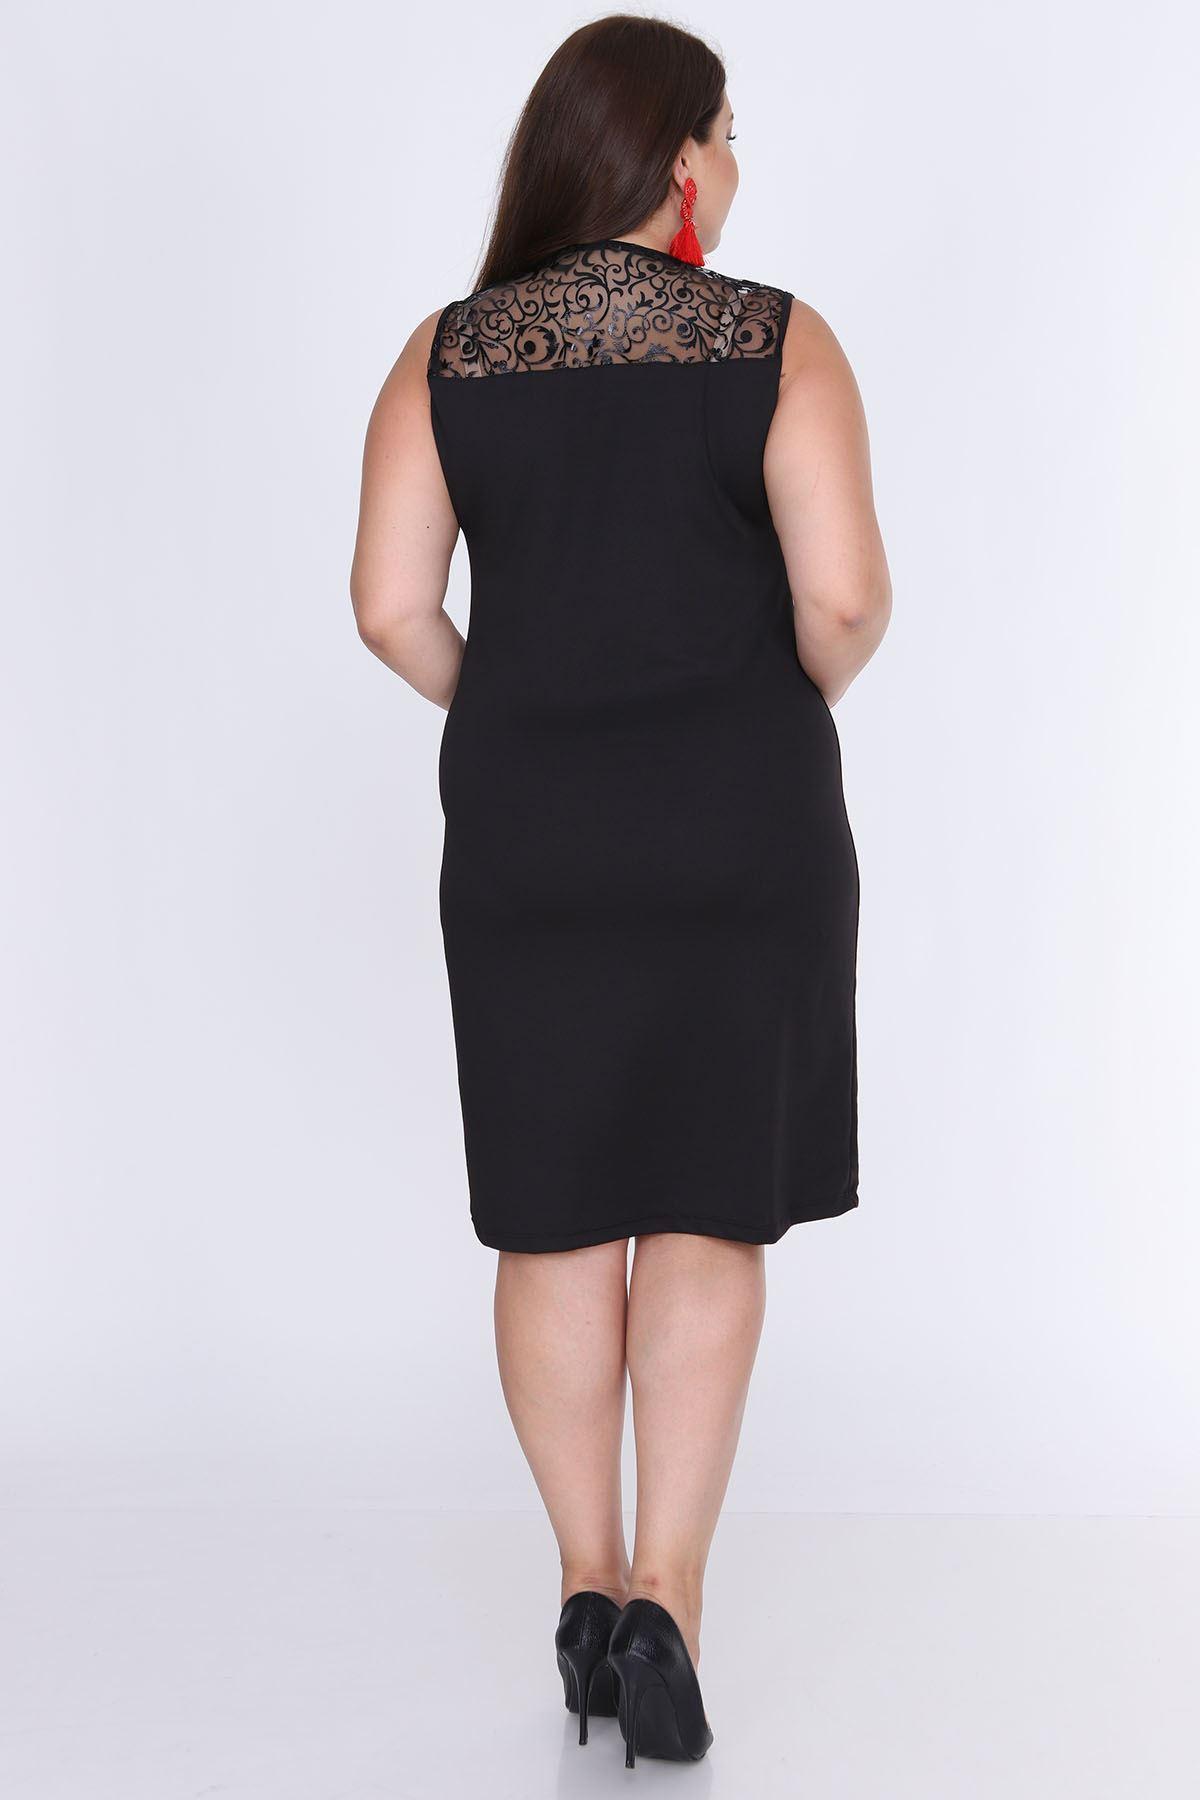 Kolsuz Siyah Esnek Büyük Beden Elbise 16D-0650